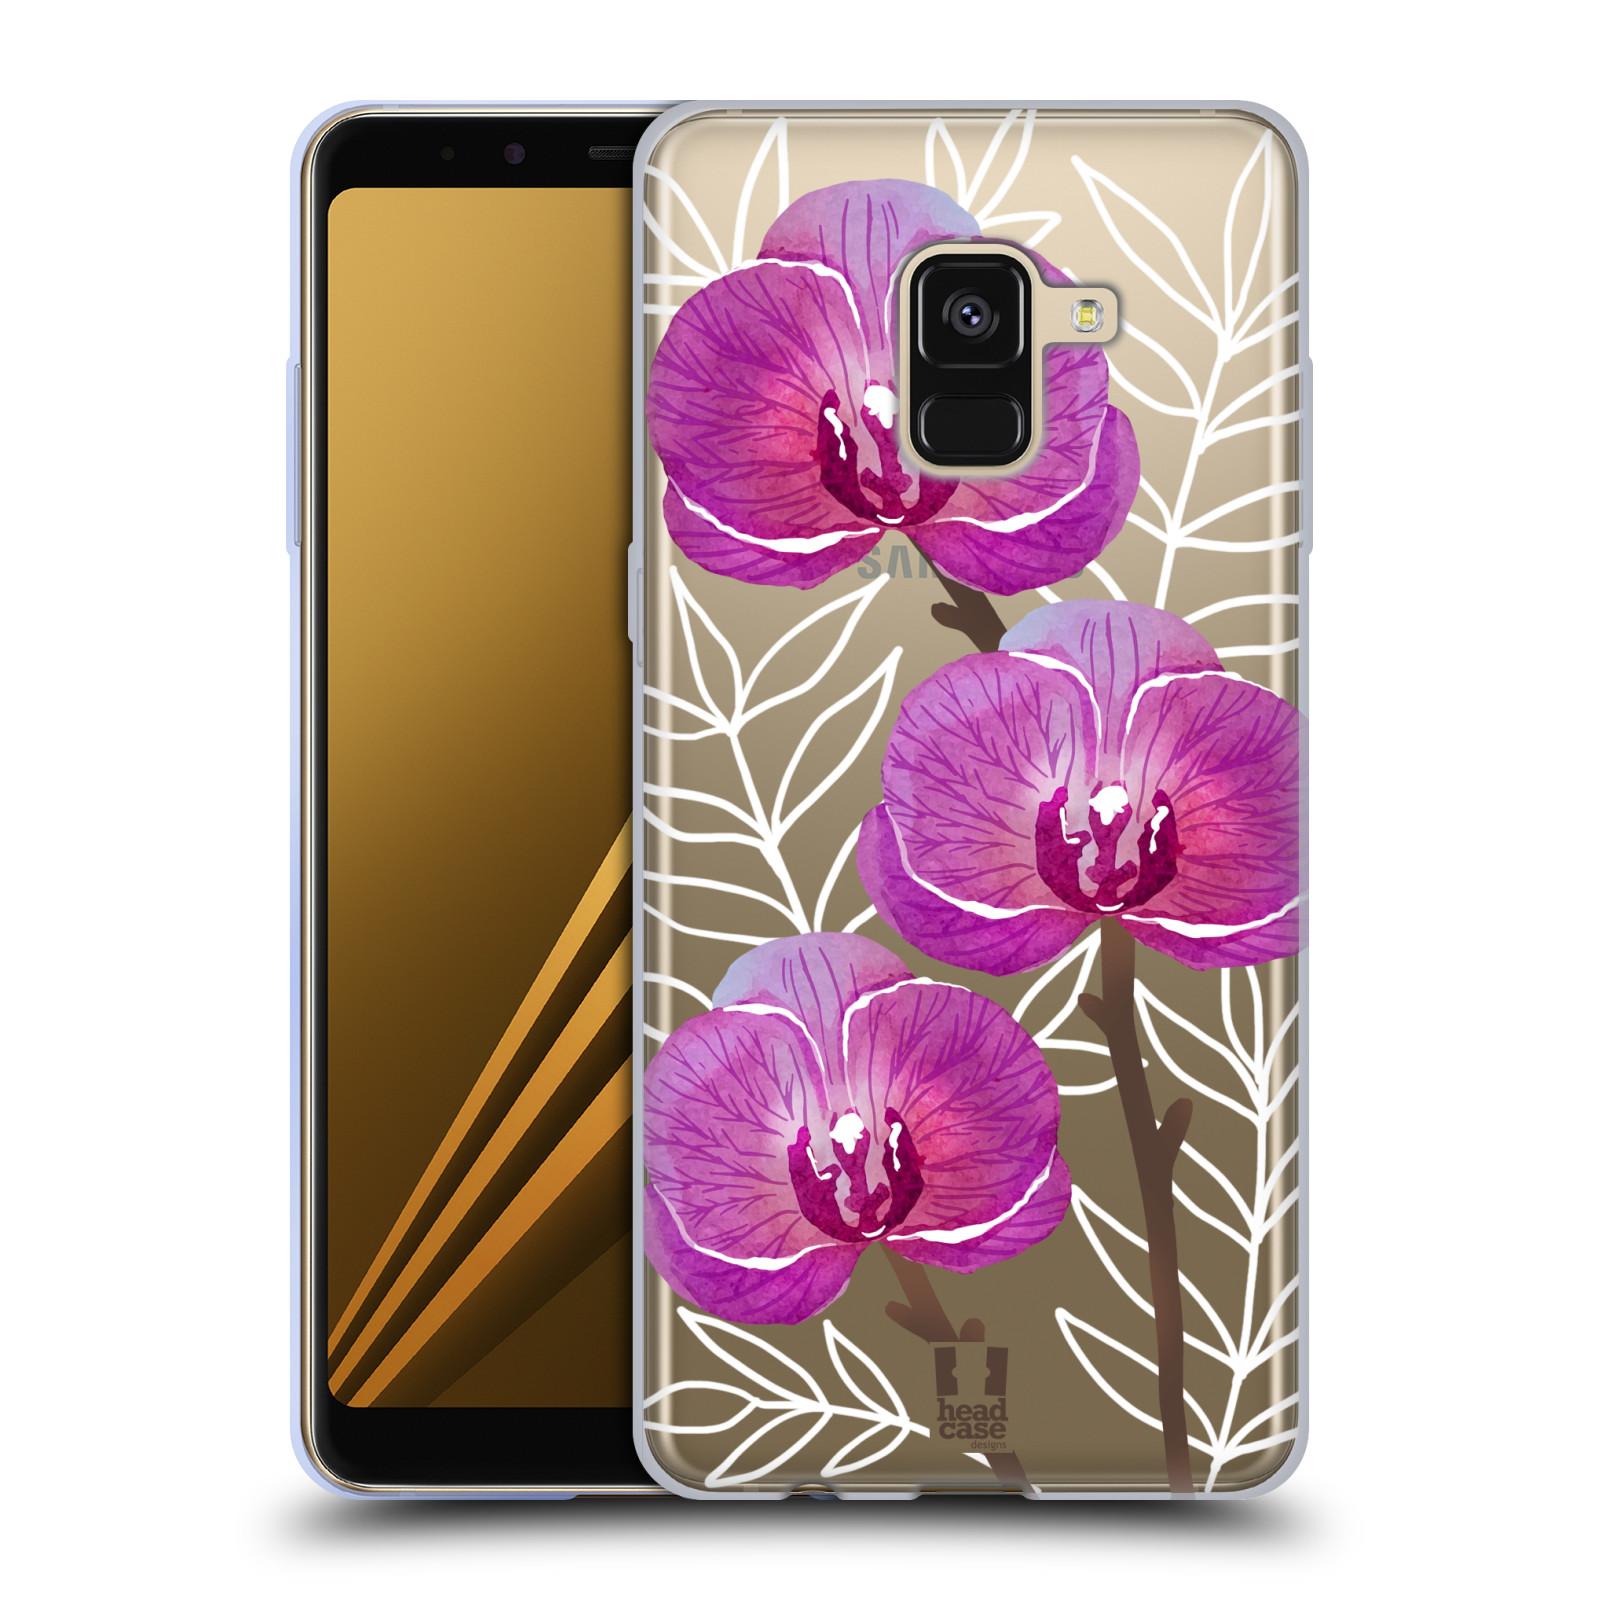 Silikonové pouzdro na mobil Samsung Galaxy A8 (2018) - Head Case - Hezoučké kvítky - průhledné